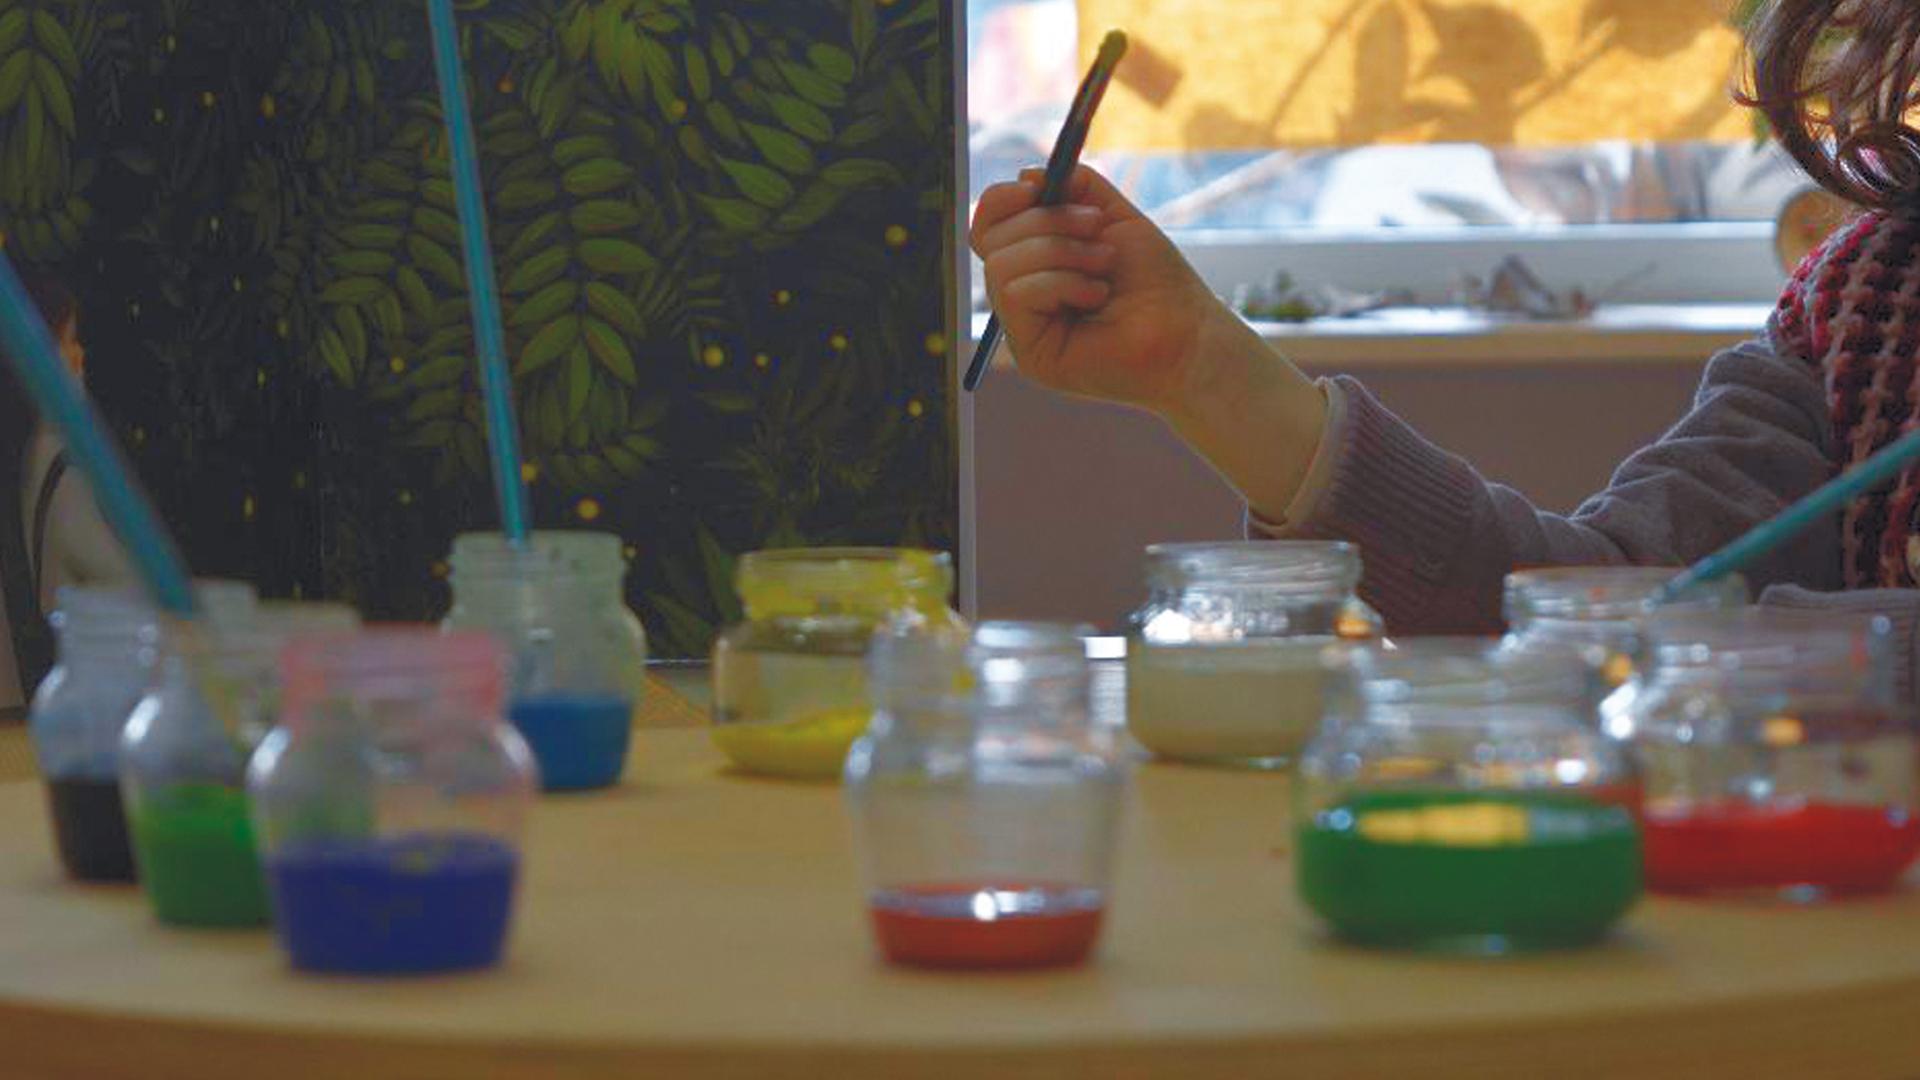 Art studio or atelier